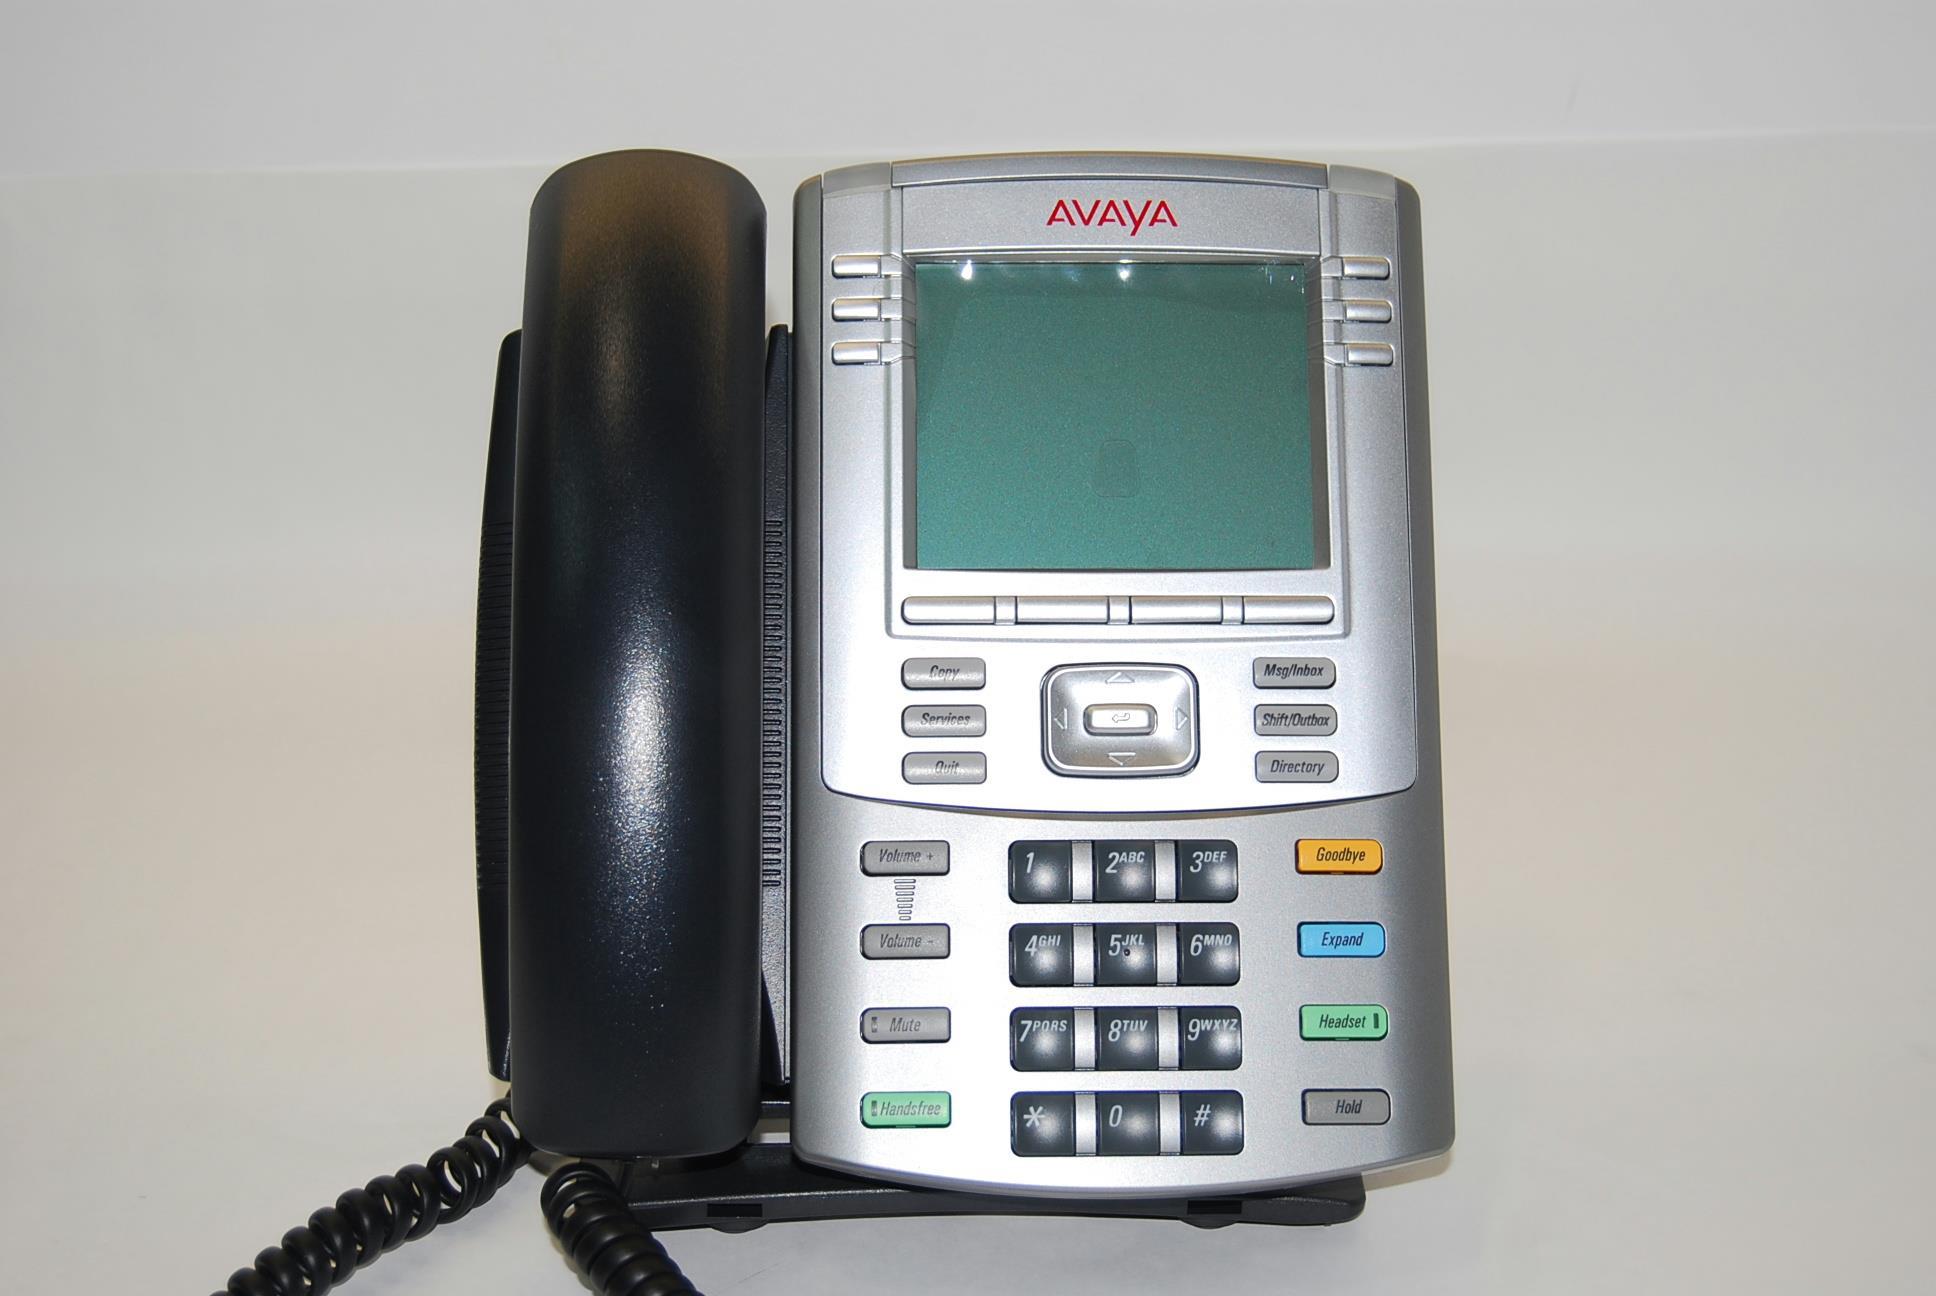 avaya ntys05bfgs ip phone 1140e graphite with text keycaps rh ebay com avaya 1120e ip deskphone manual avaya 1120e ip deskphone manual